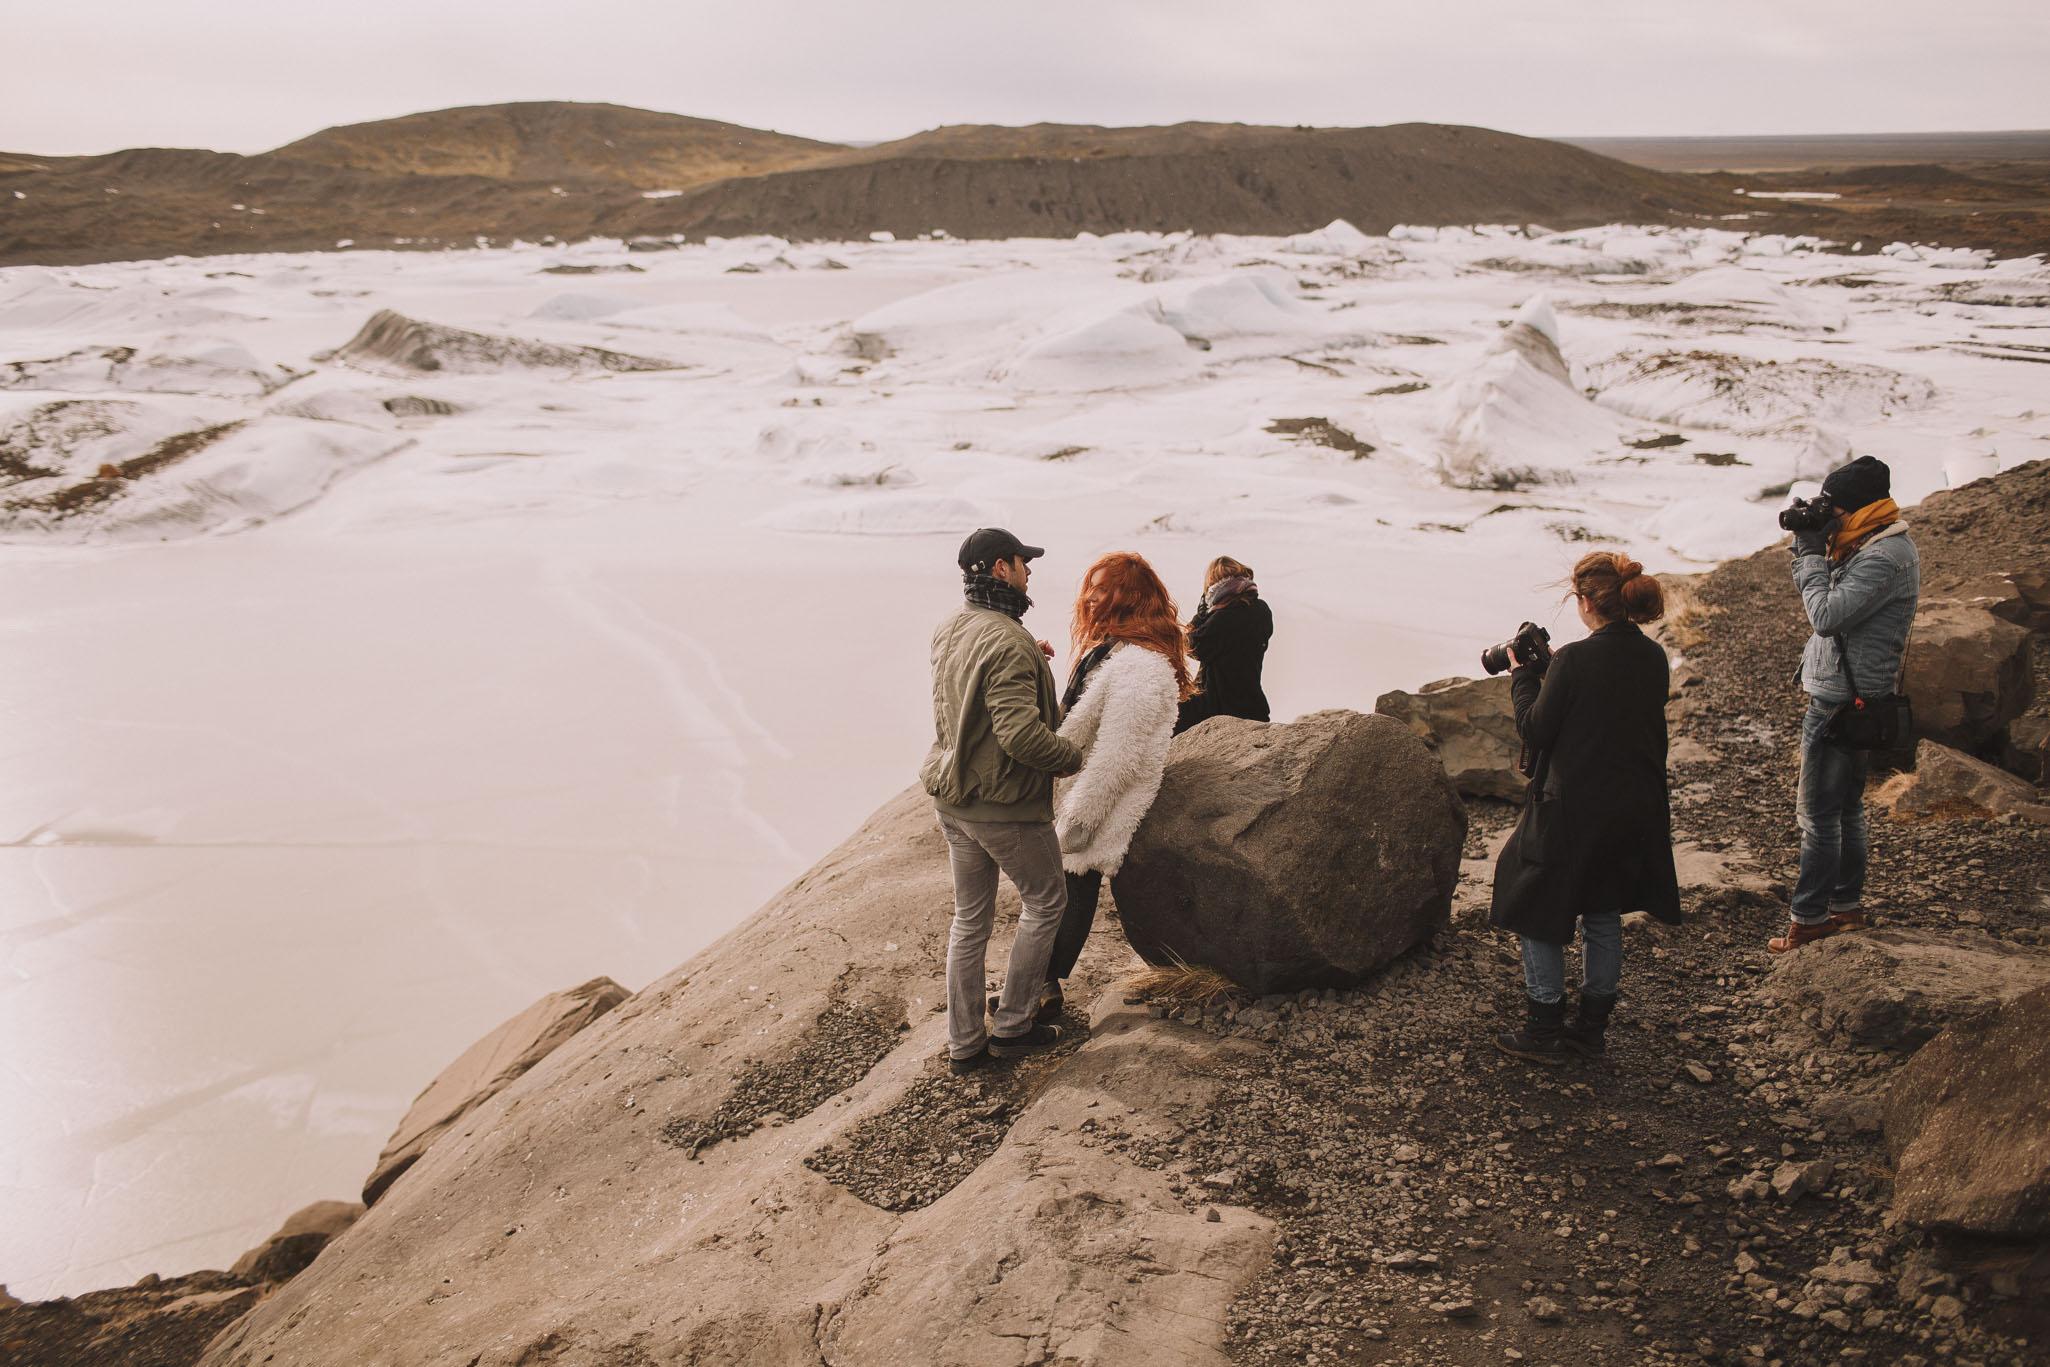 Road-trip-Islande-Iceland-Voyage-Travel-Portrait-Jérémy-Boyer-Skaftafellsjokull-4.jpg